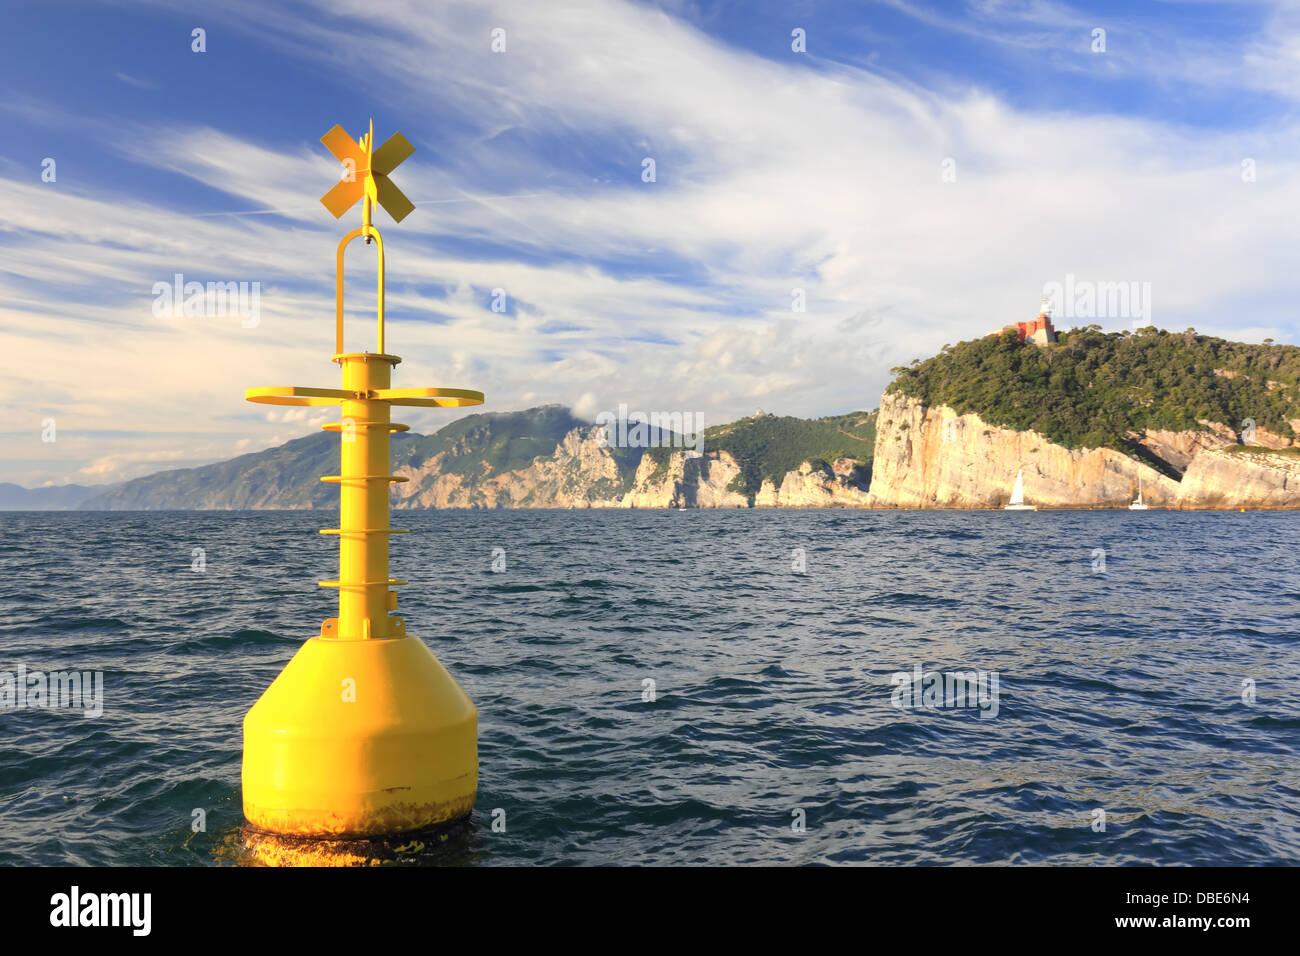 floating yellow buoy on mediterranean coast in front of portovenere, la spezia, italy - Stock Image